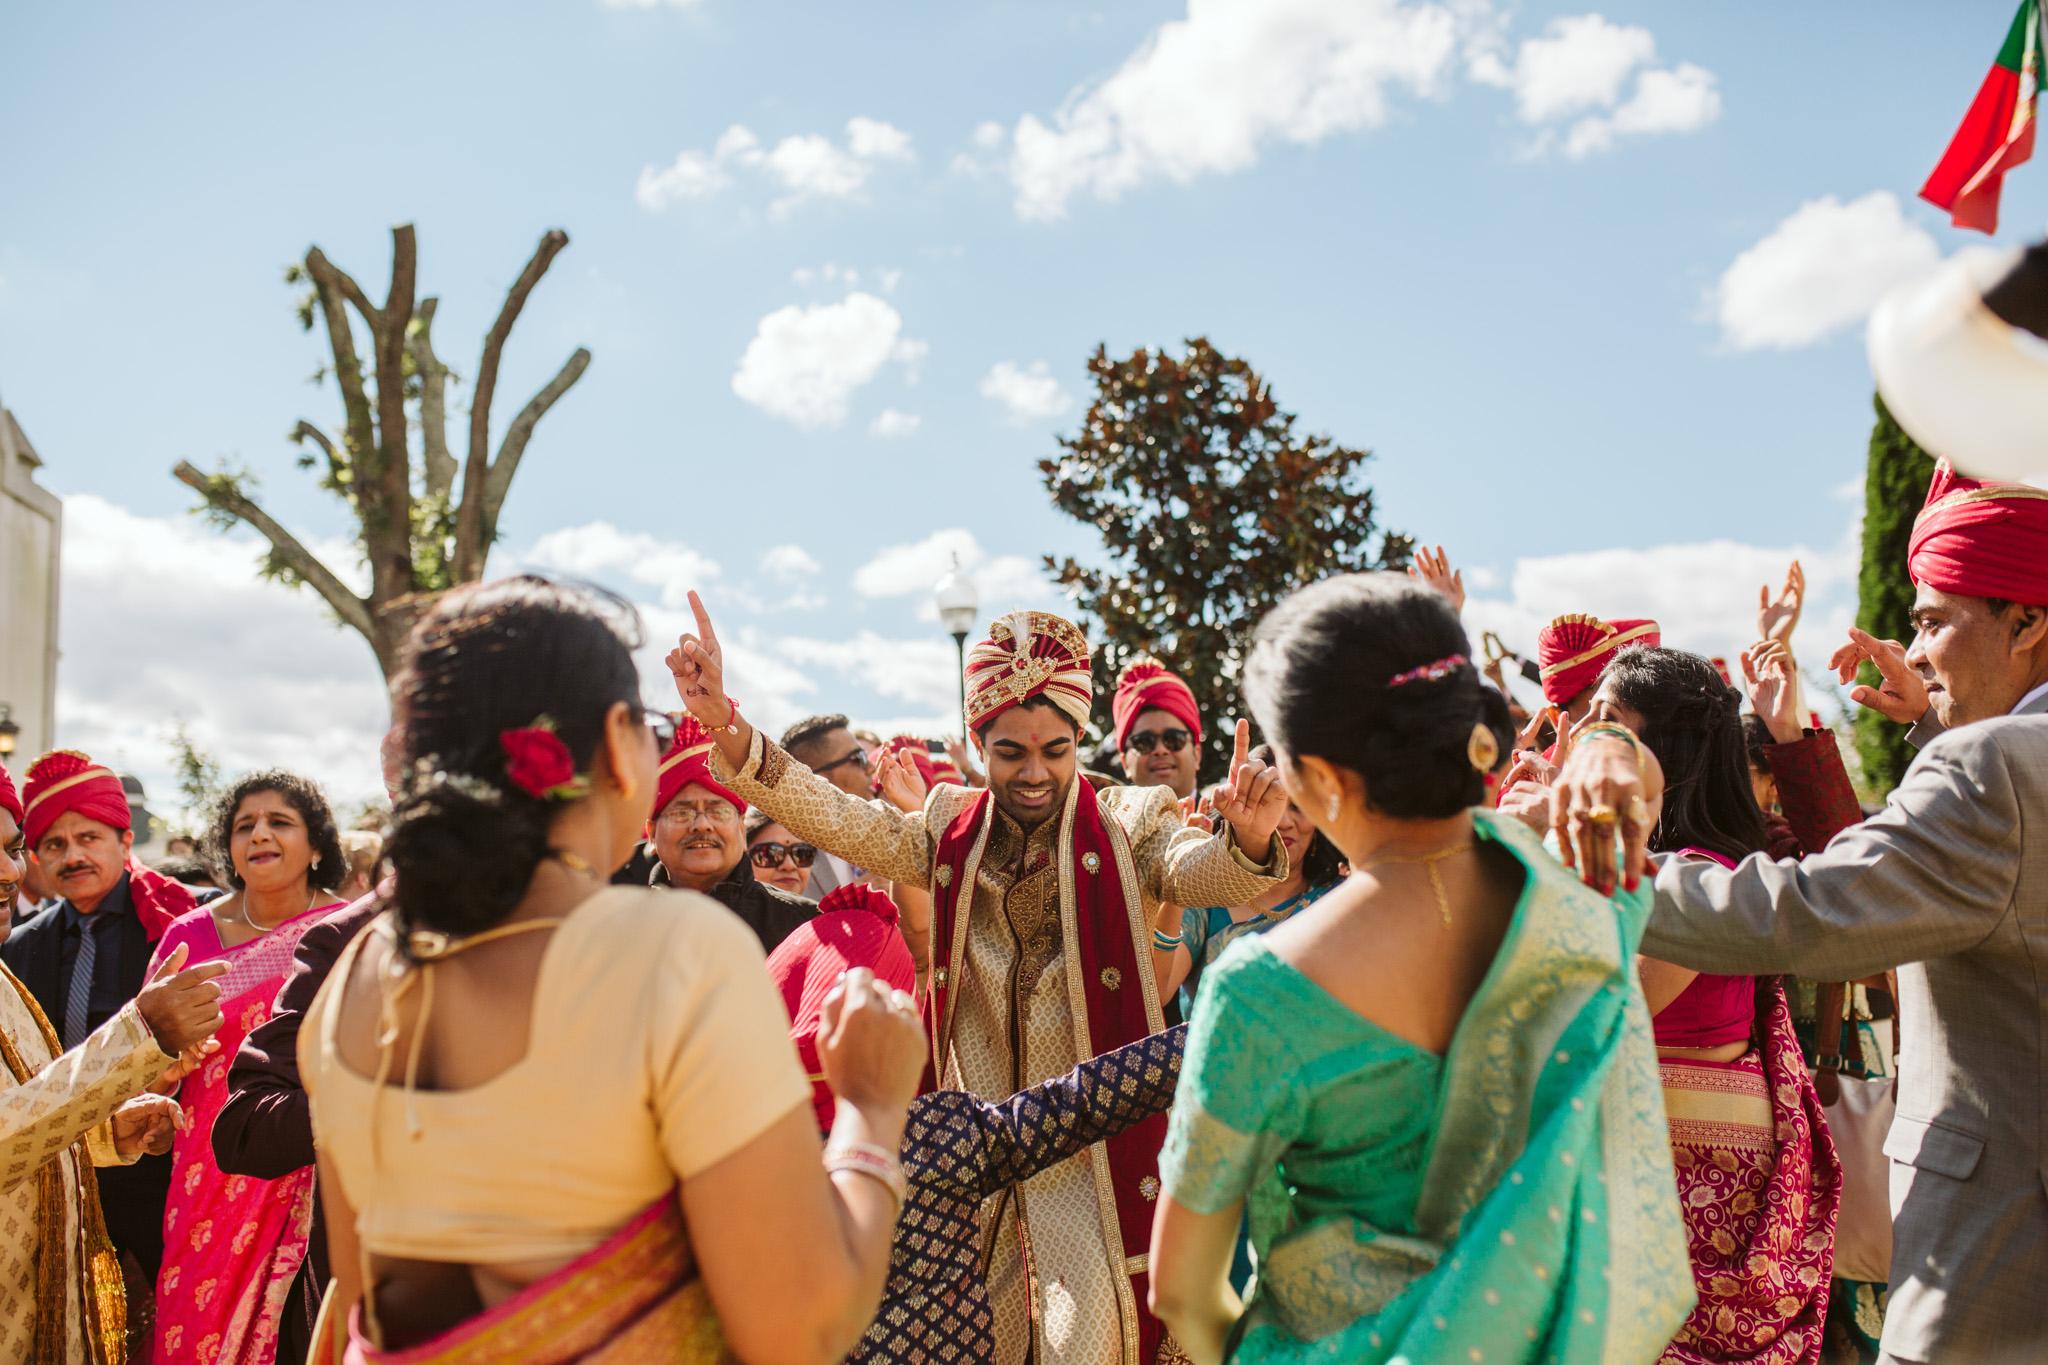 rebeccaburtphotography.hindiwedding.moraisvineyards.virginiawedding-99.JPG